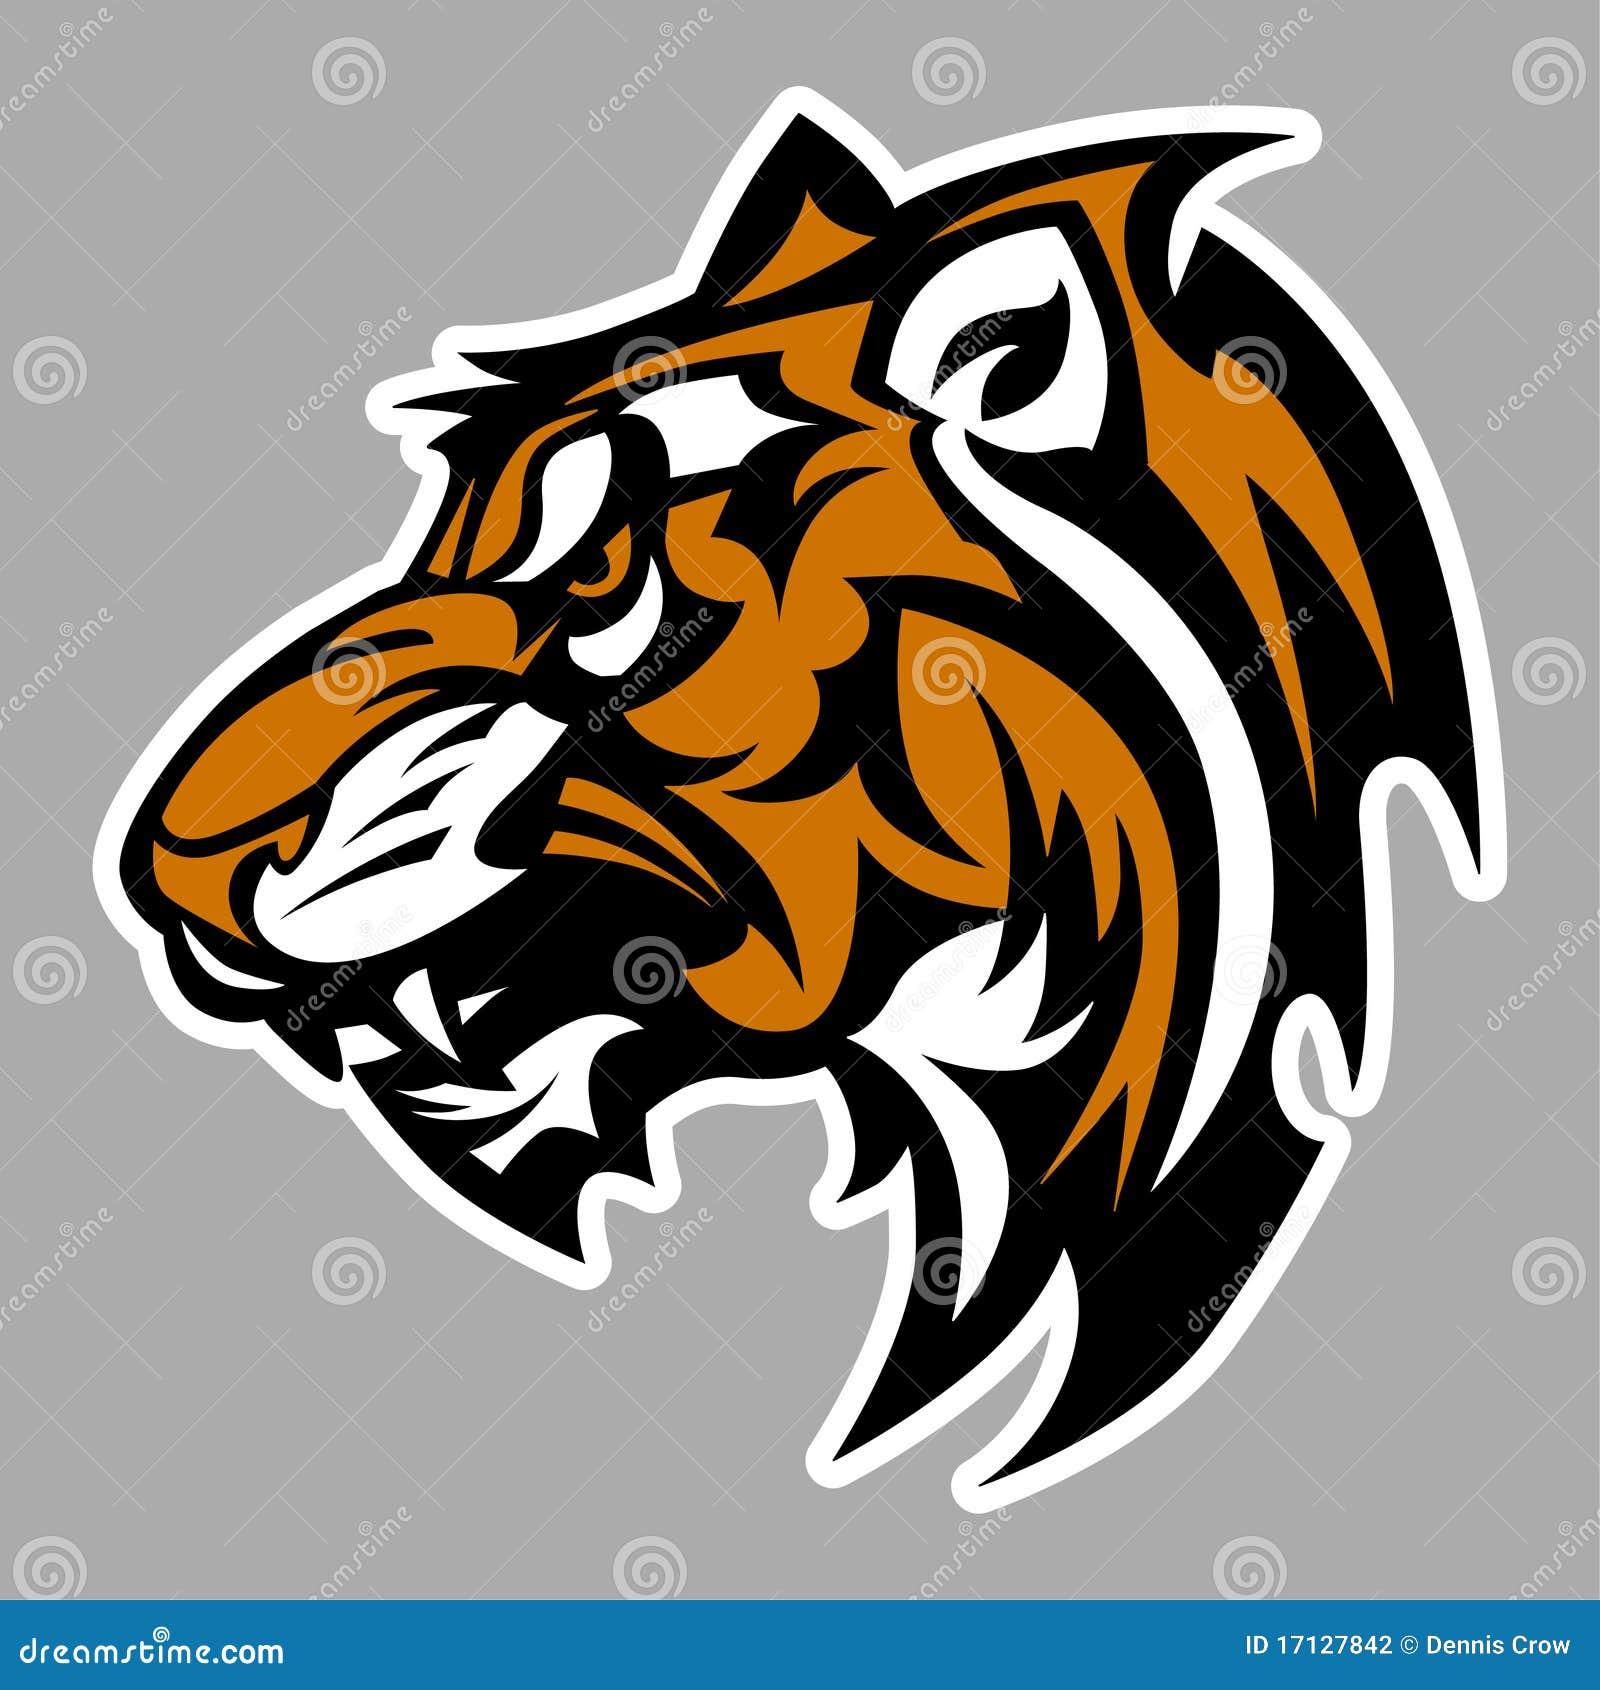 Tiger Mascot Vector Logo Stock Photography - Image: 17127842